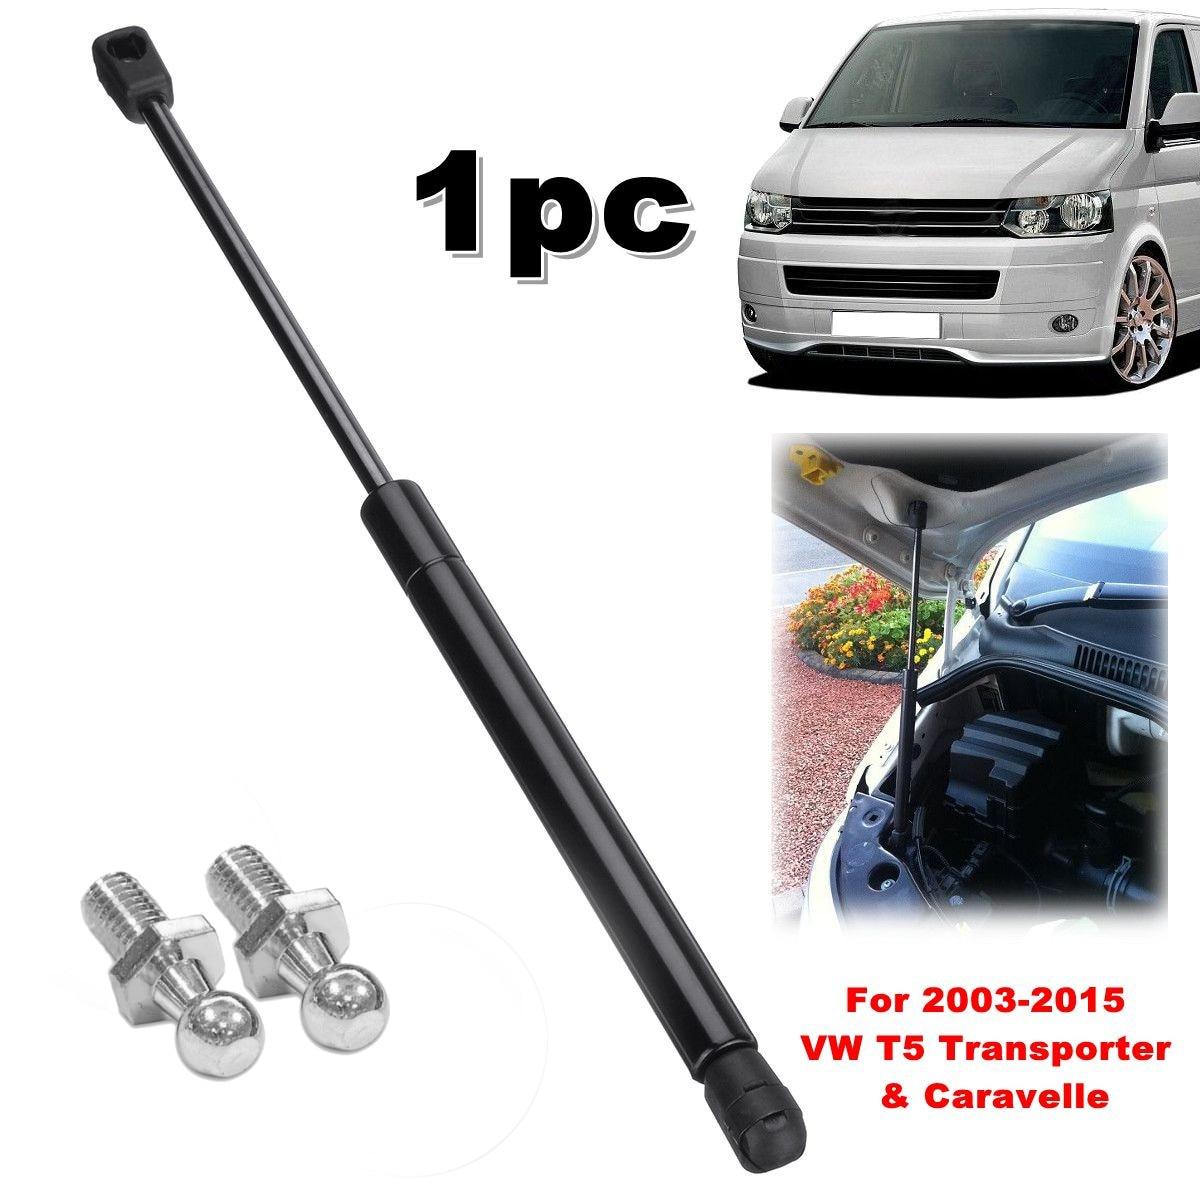 1Pc capó delantero soporte de campana puntal de Gas de 7E0823359 para Volkswagen VW T5 transportador Caravelle 2003, 2004, 2005, 2006, 2007-2015